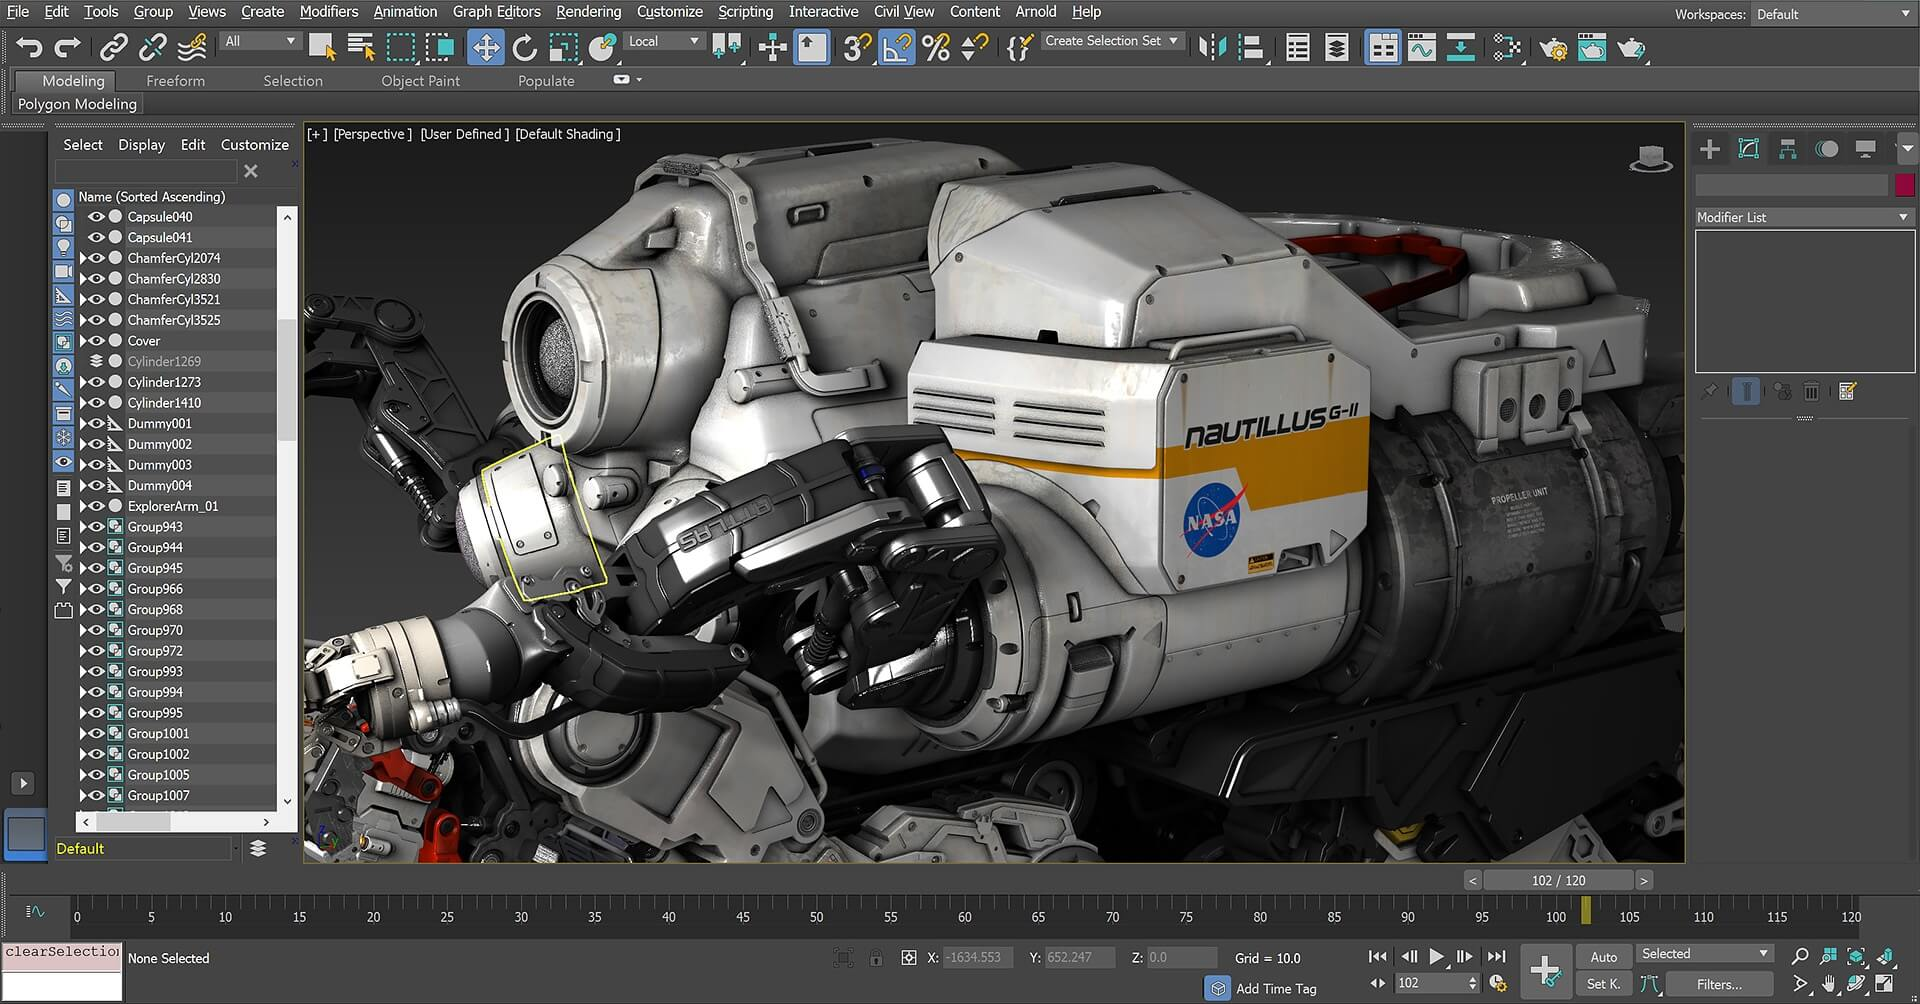 Autodesk 3DSMAX Viewport User Interface overview